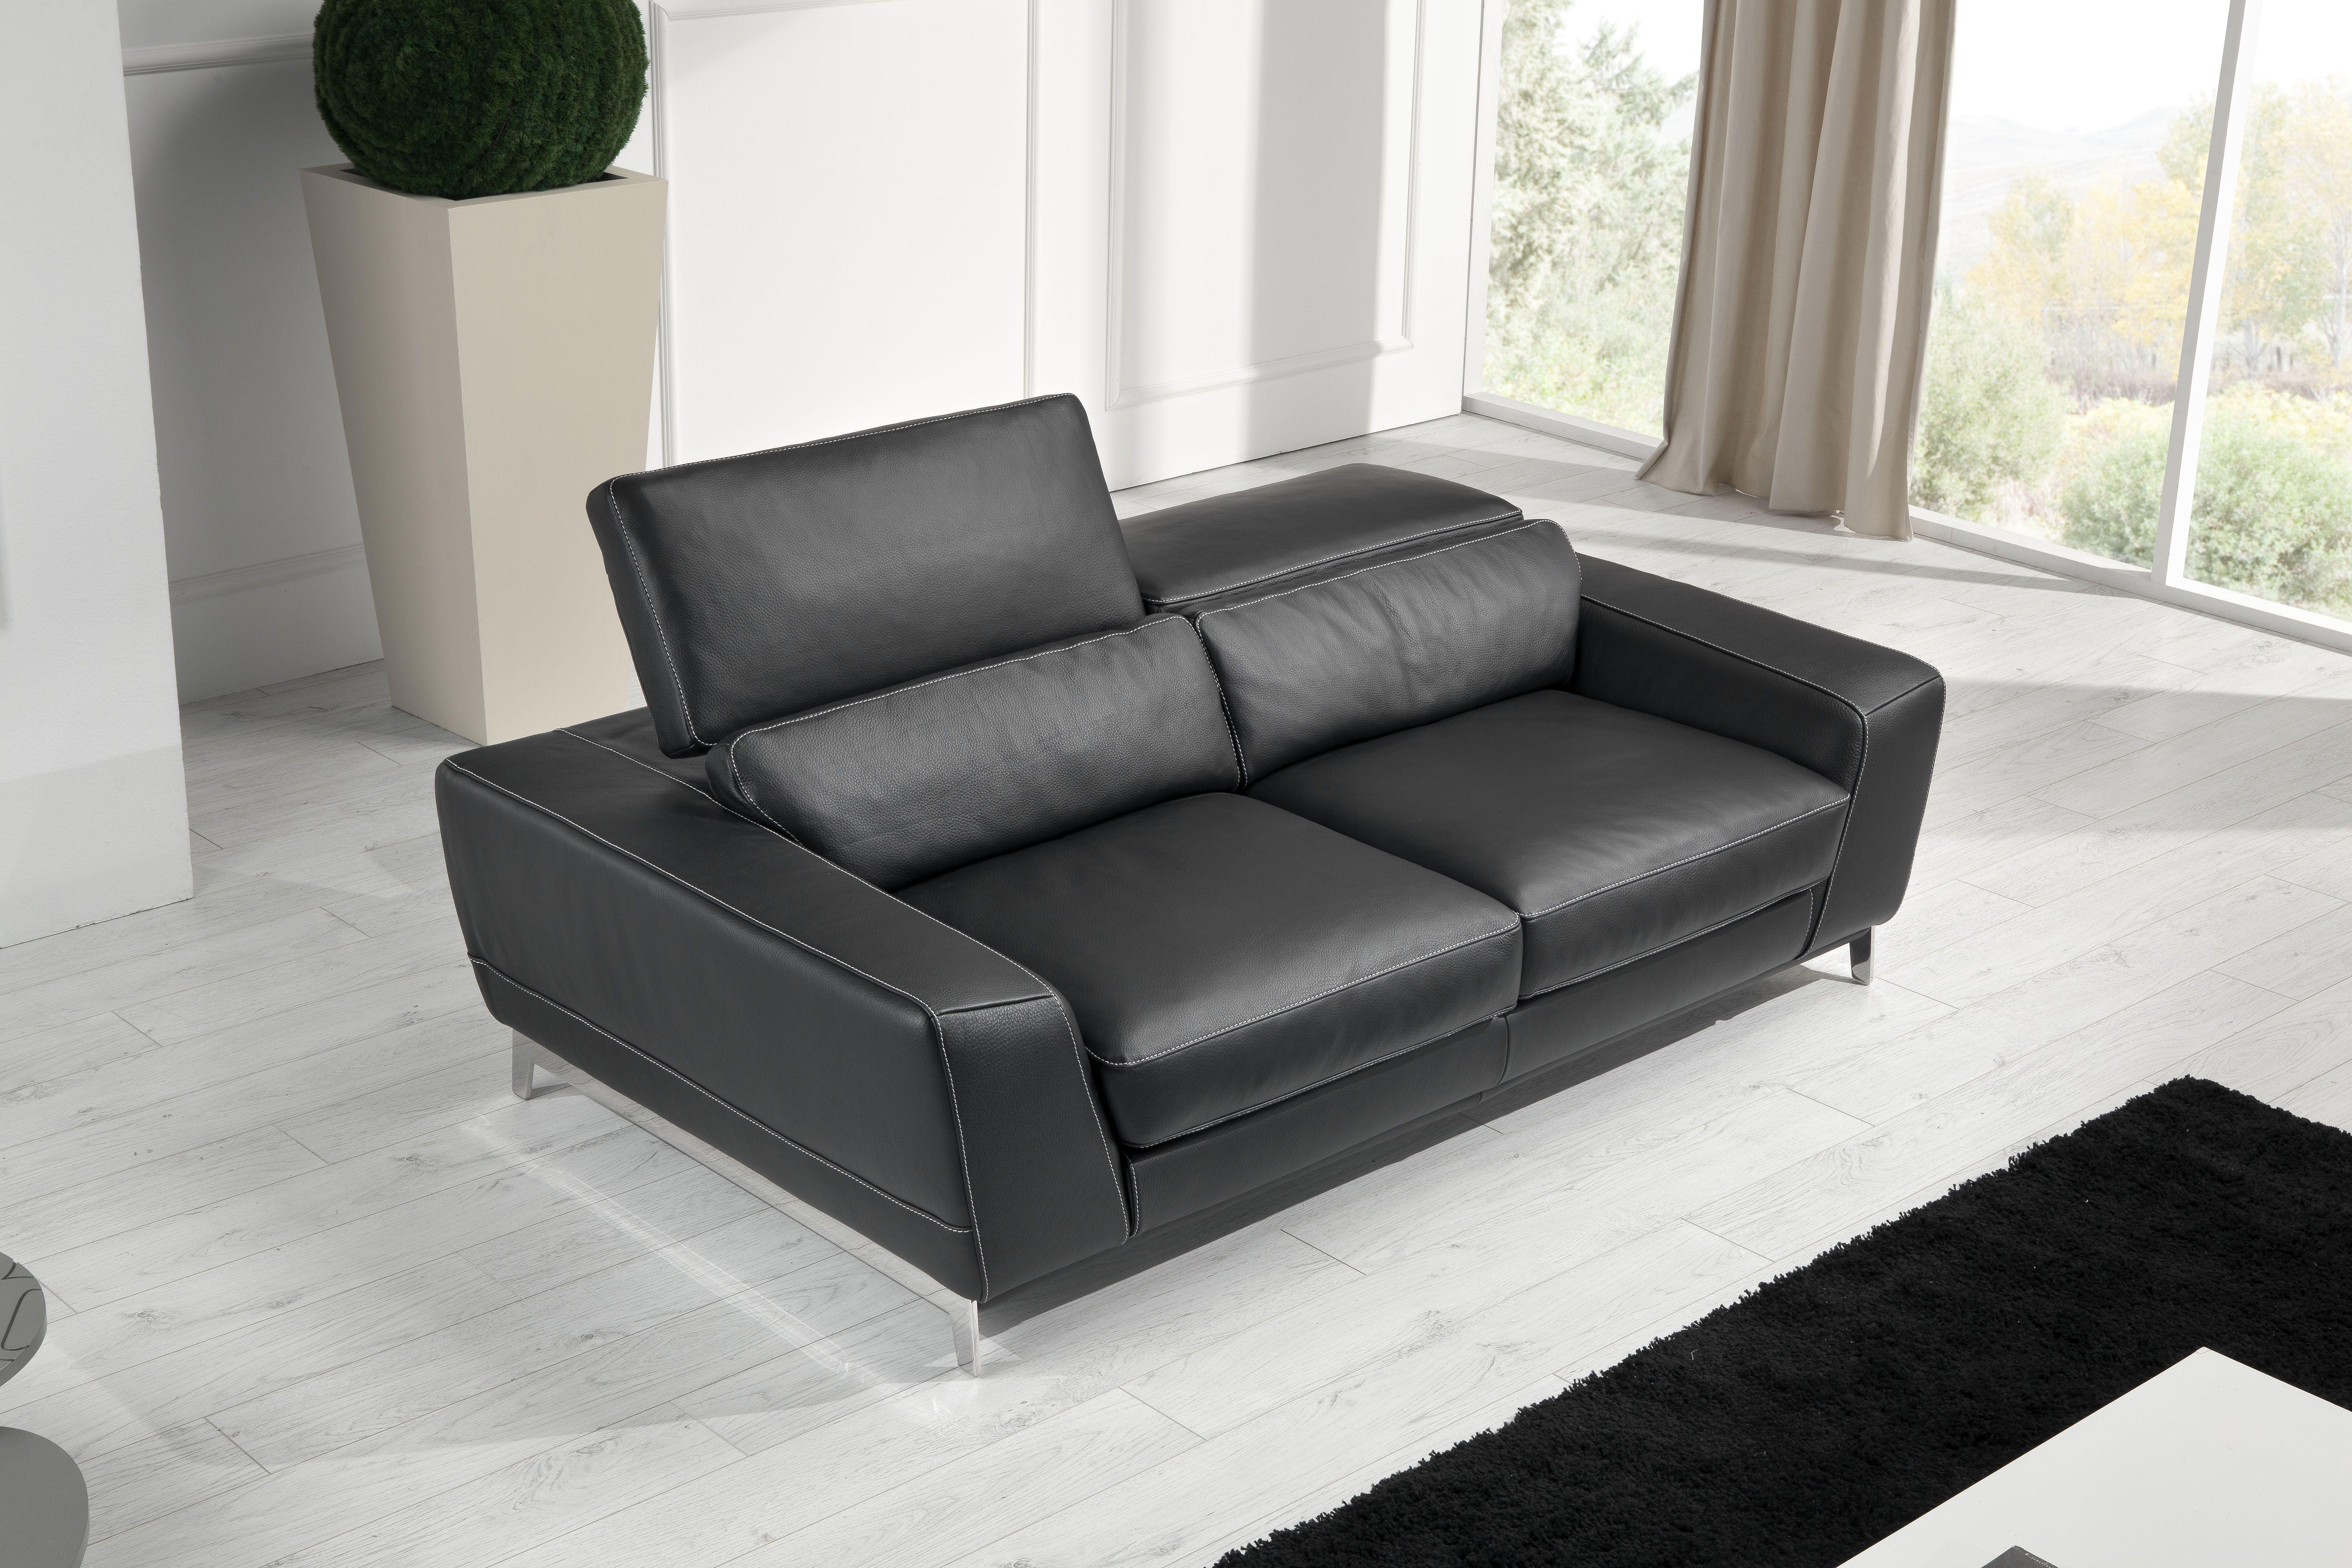 Ecointeriors Ecoexclusive Egoitaliano Couch Italian Design Dublin Santry Dunlaoghaire Design Couch Interior